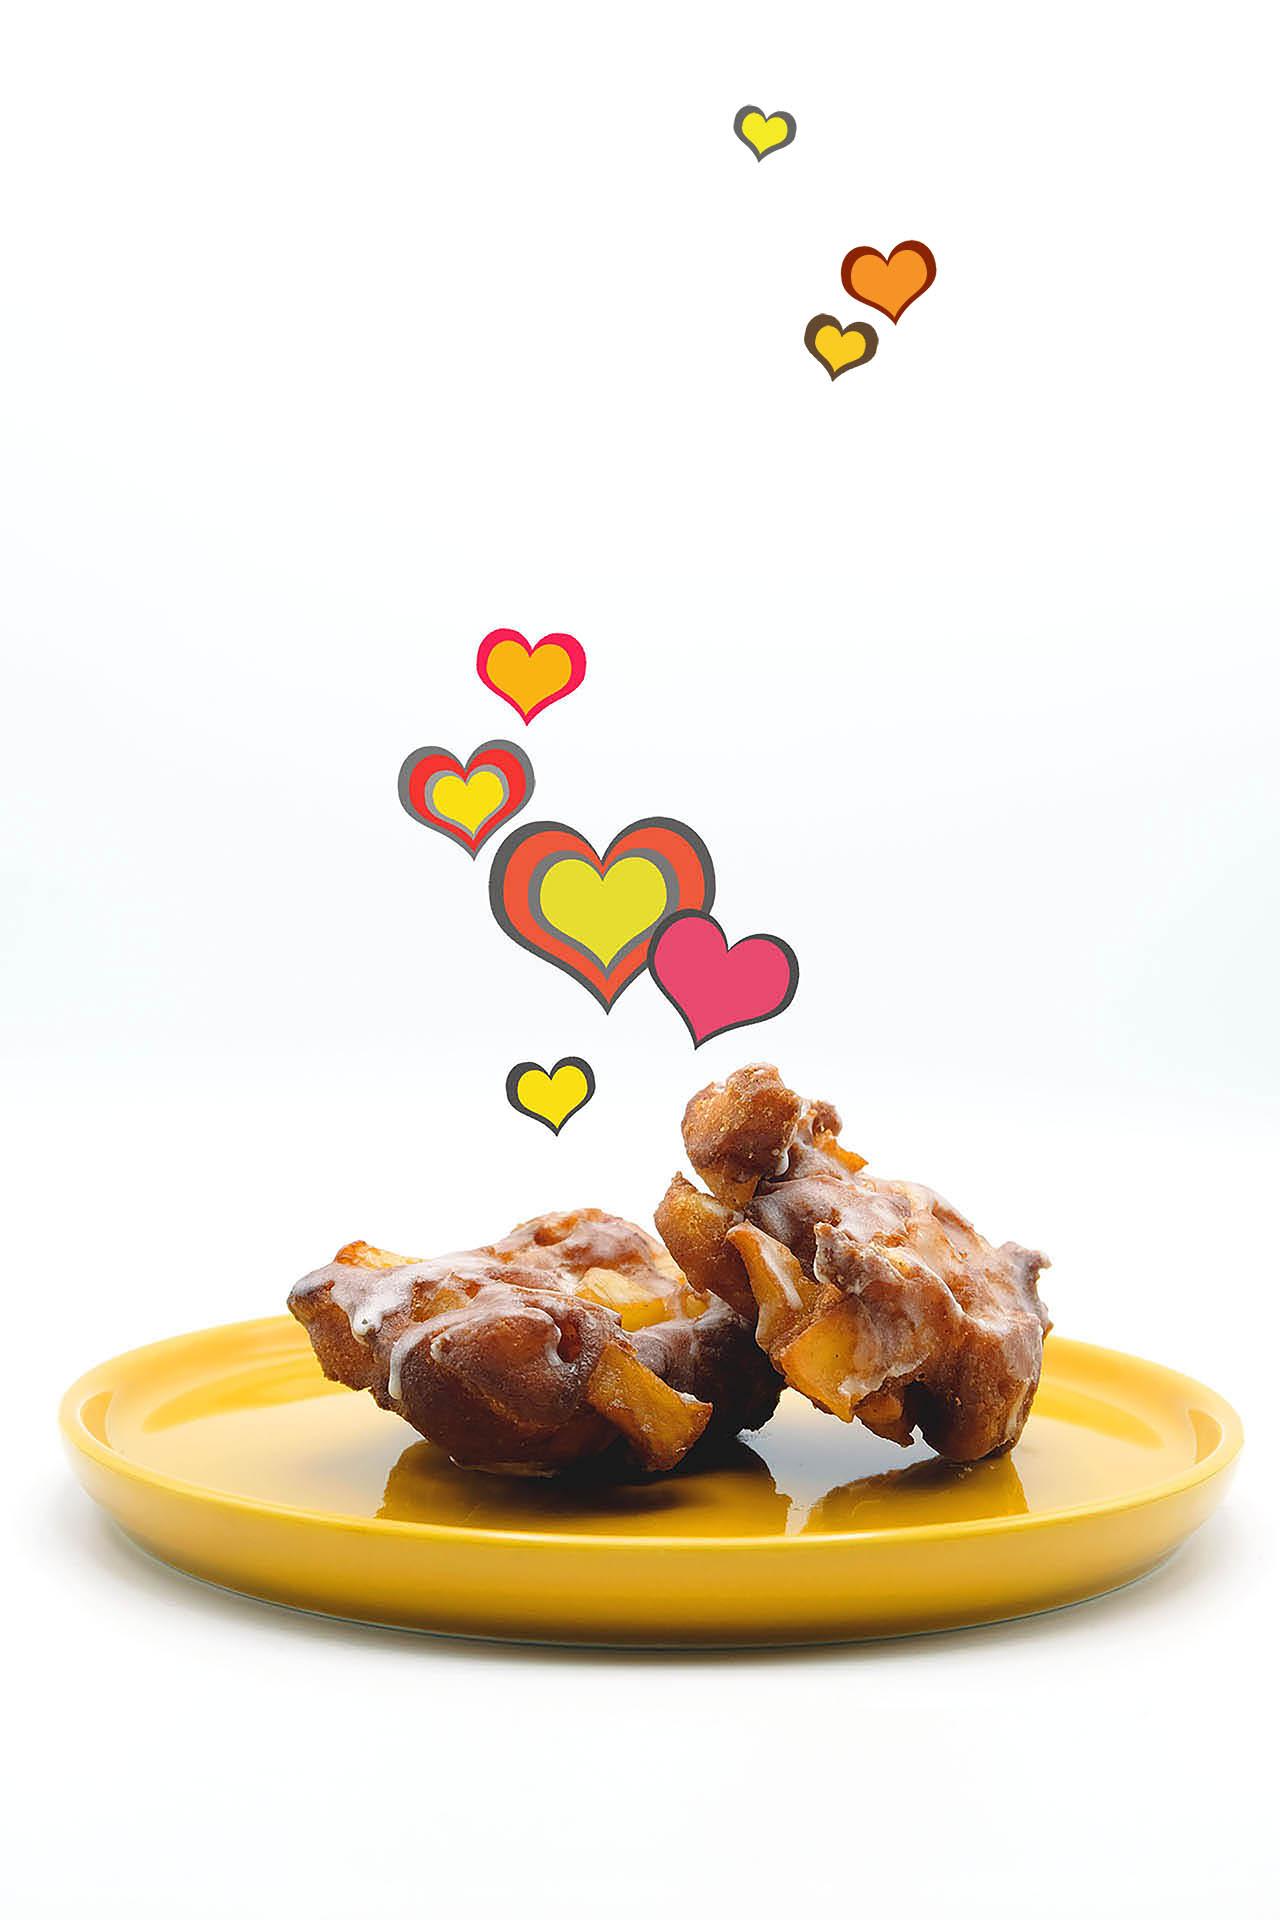 Rezept Apple Fritters Popdish Foodblog, Gerichte, die knallen,